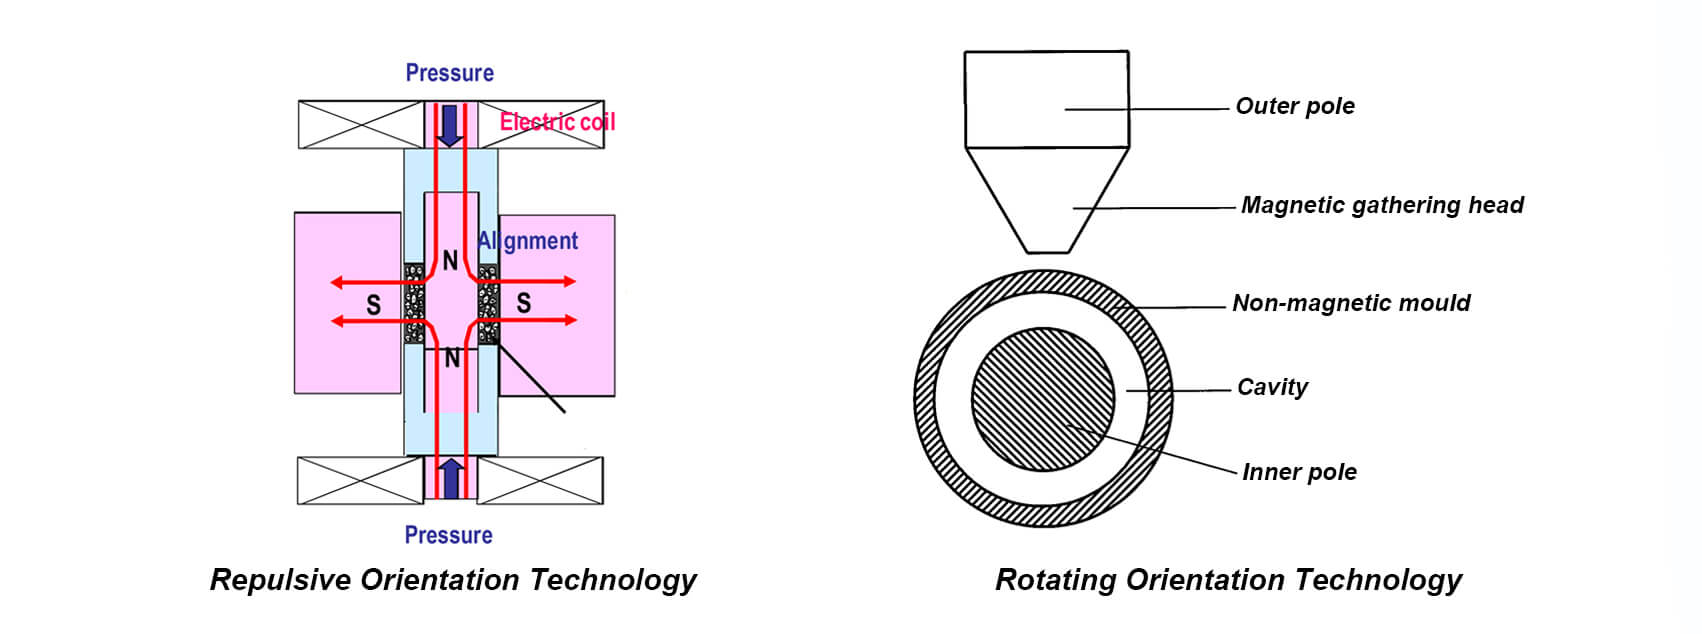 Imanes anulares de NdFeB orientados radialmente-2